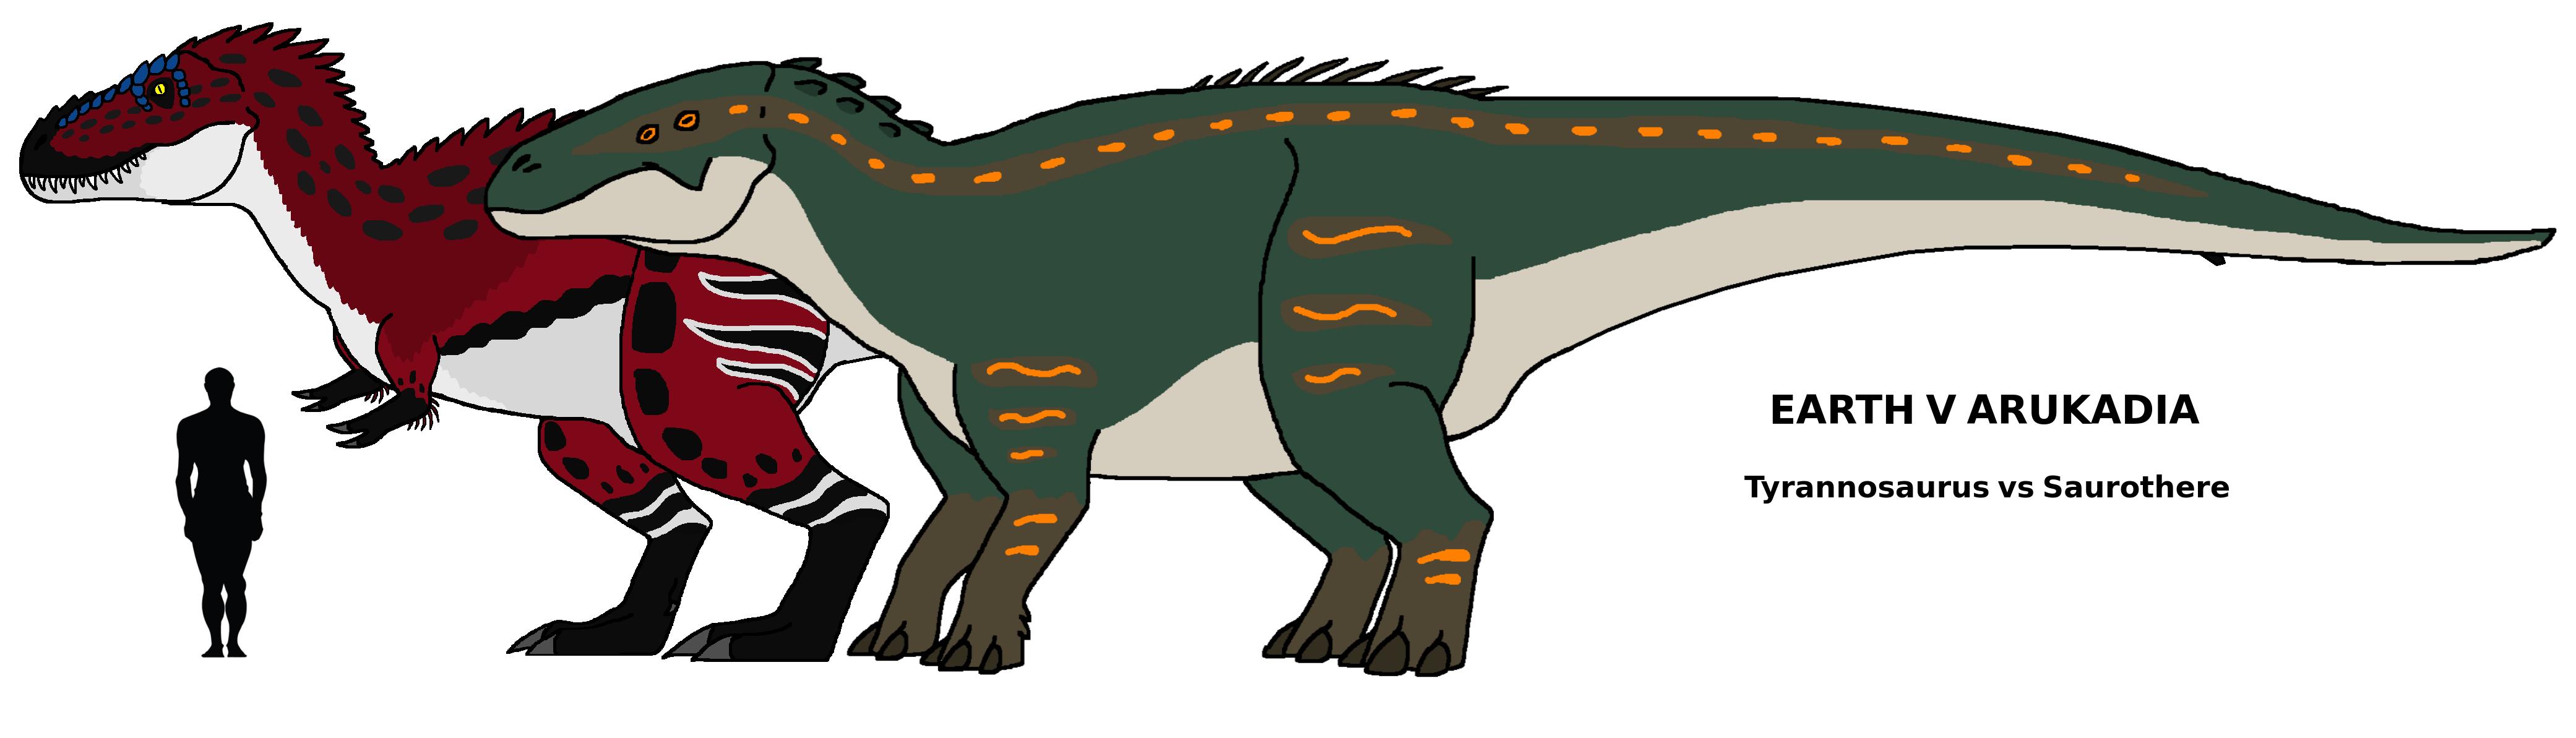 Tyrannosaurus Rex Vs Carnotaurus | www.pixshark.com ...